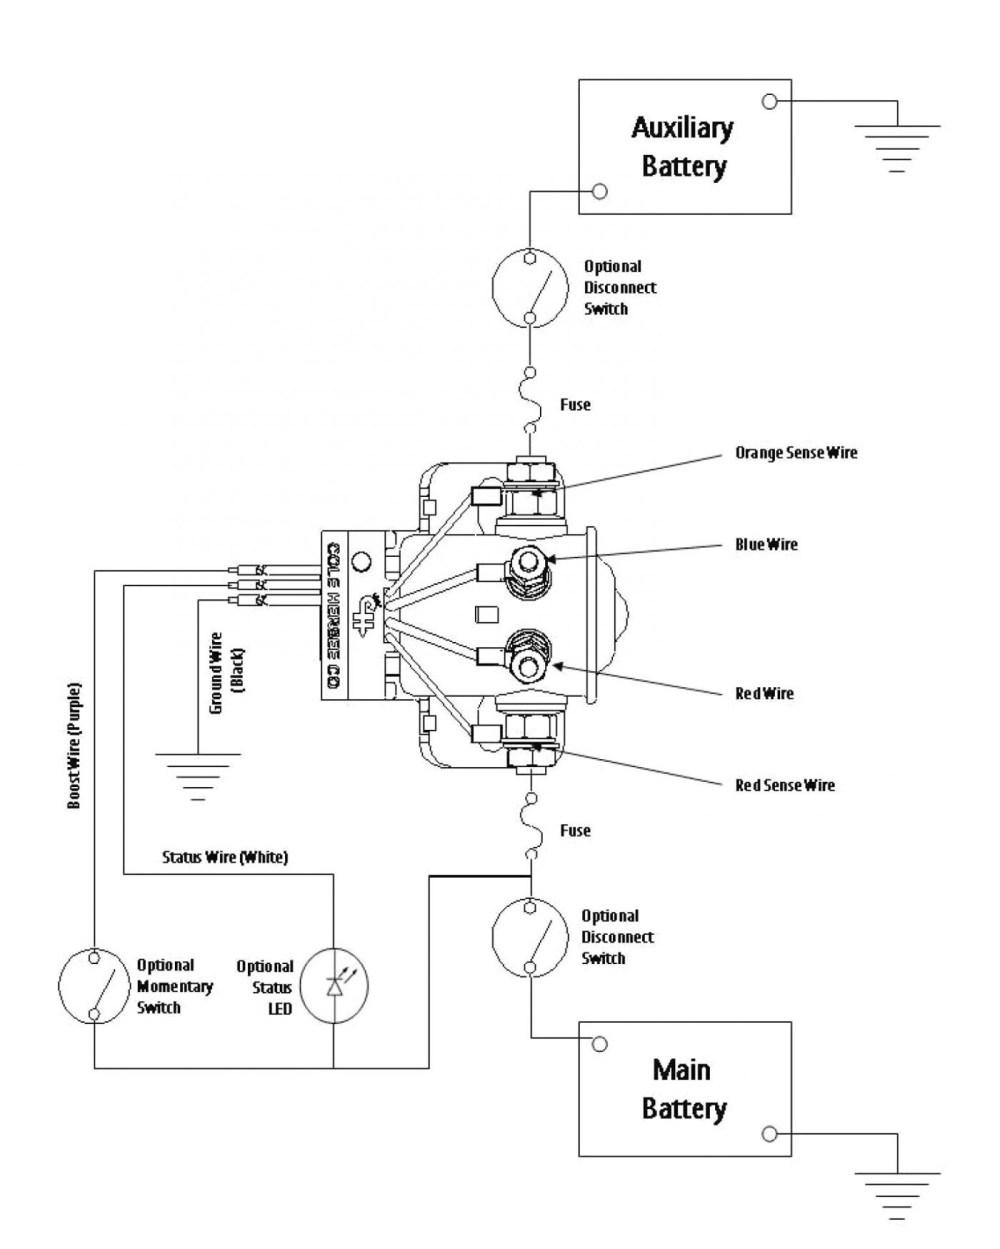 medium resolution of bep marine battery switch wiring diagram wiring diagram in addition rv battery isolator diagram wiring